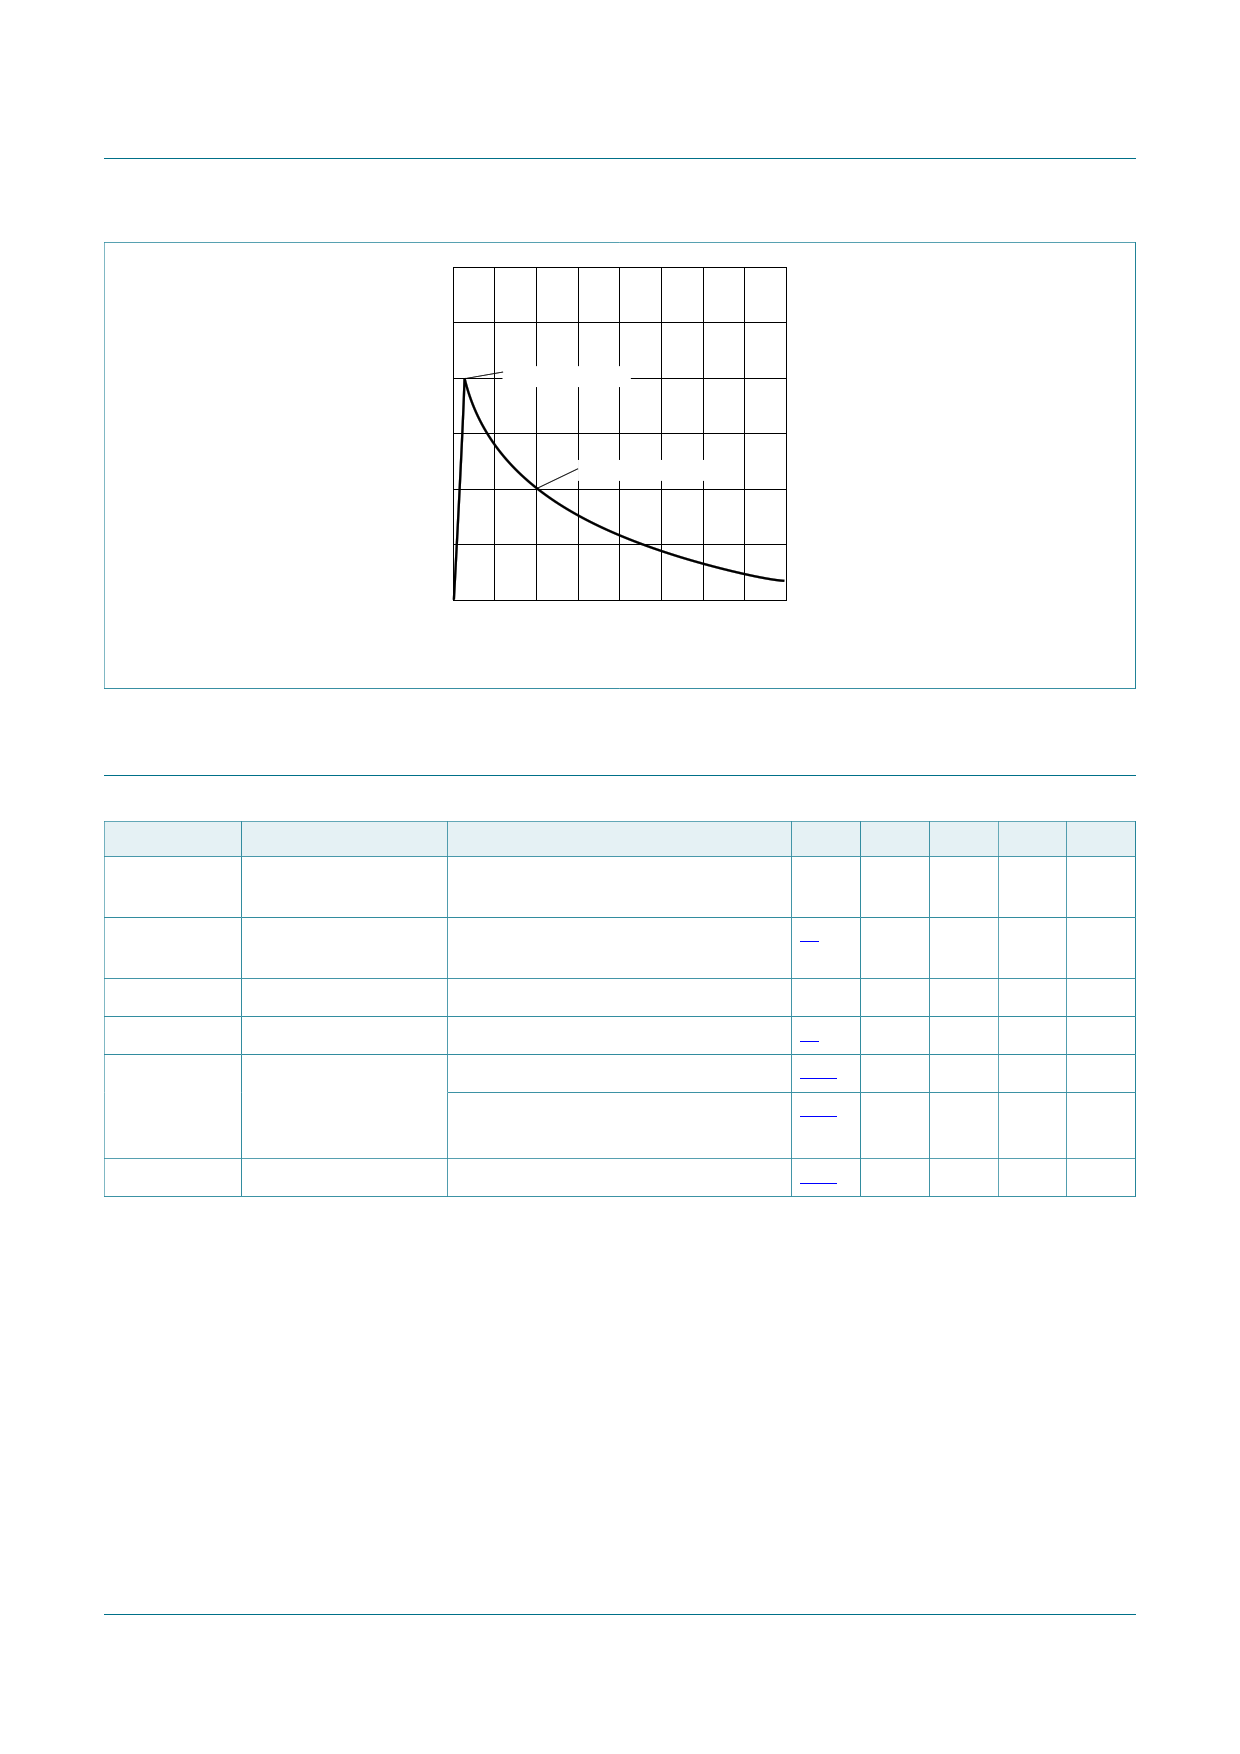 PTVS12VZ1USKN pdf, 반도체, 판매, 대치품